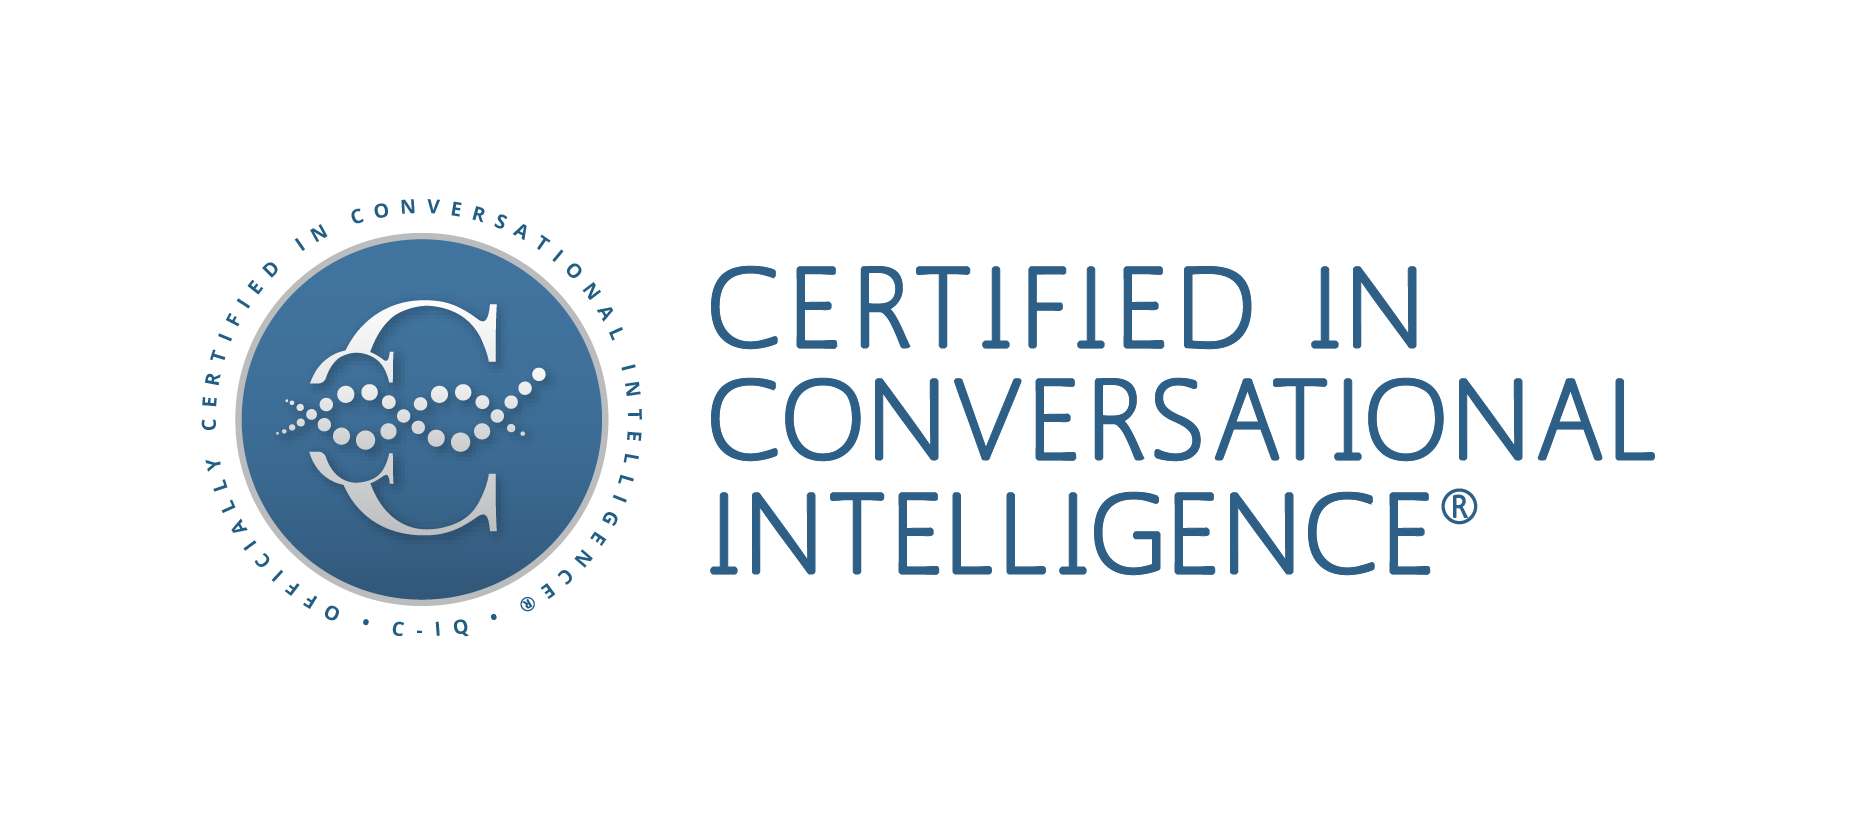 heidi-sadecky-certified-conversation-intelligence-pittsburgh